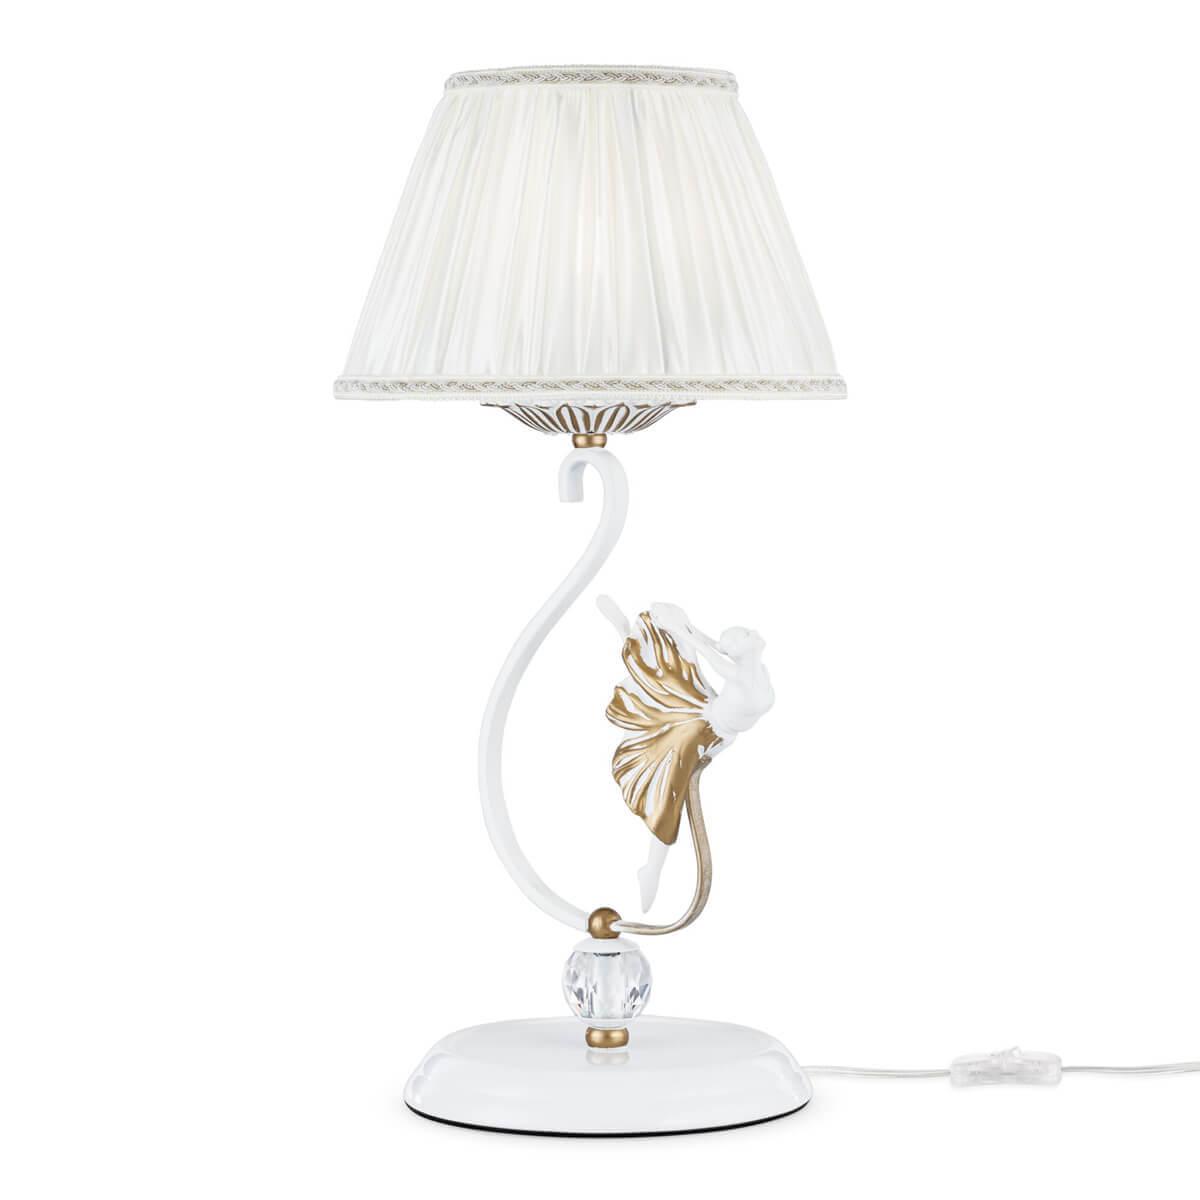 Настольная лампа Maytoni ARM222-11-G Elina фото